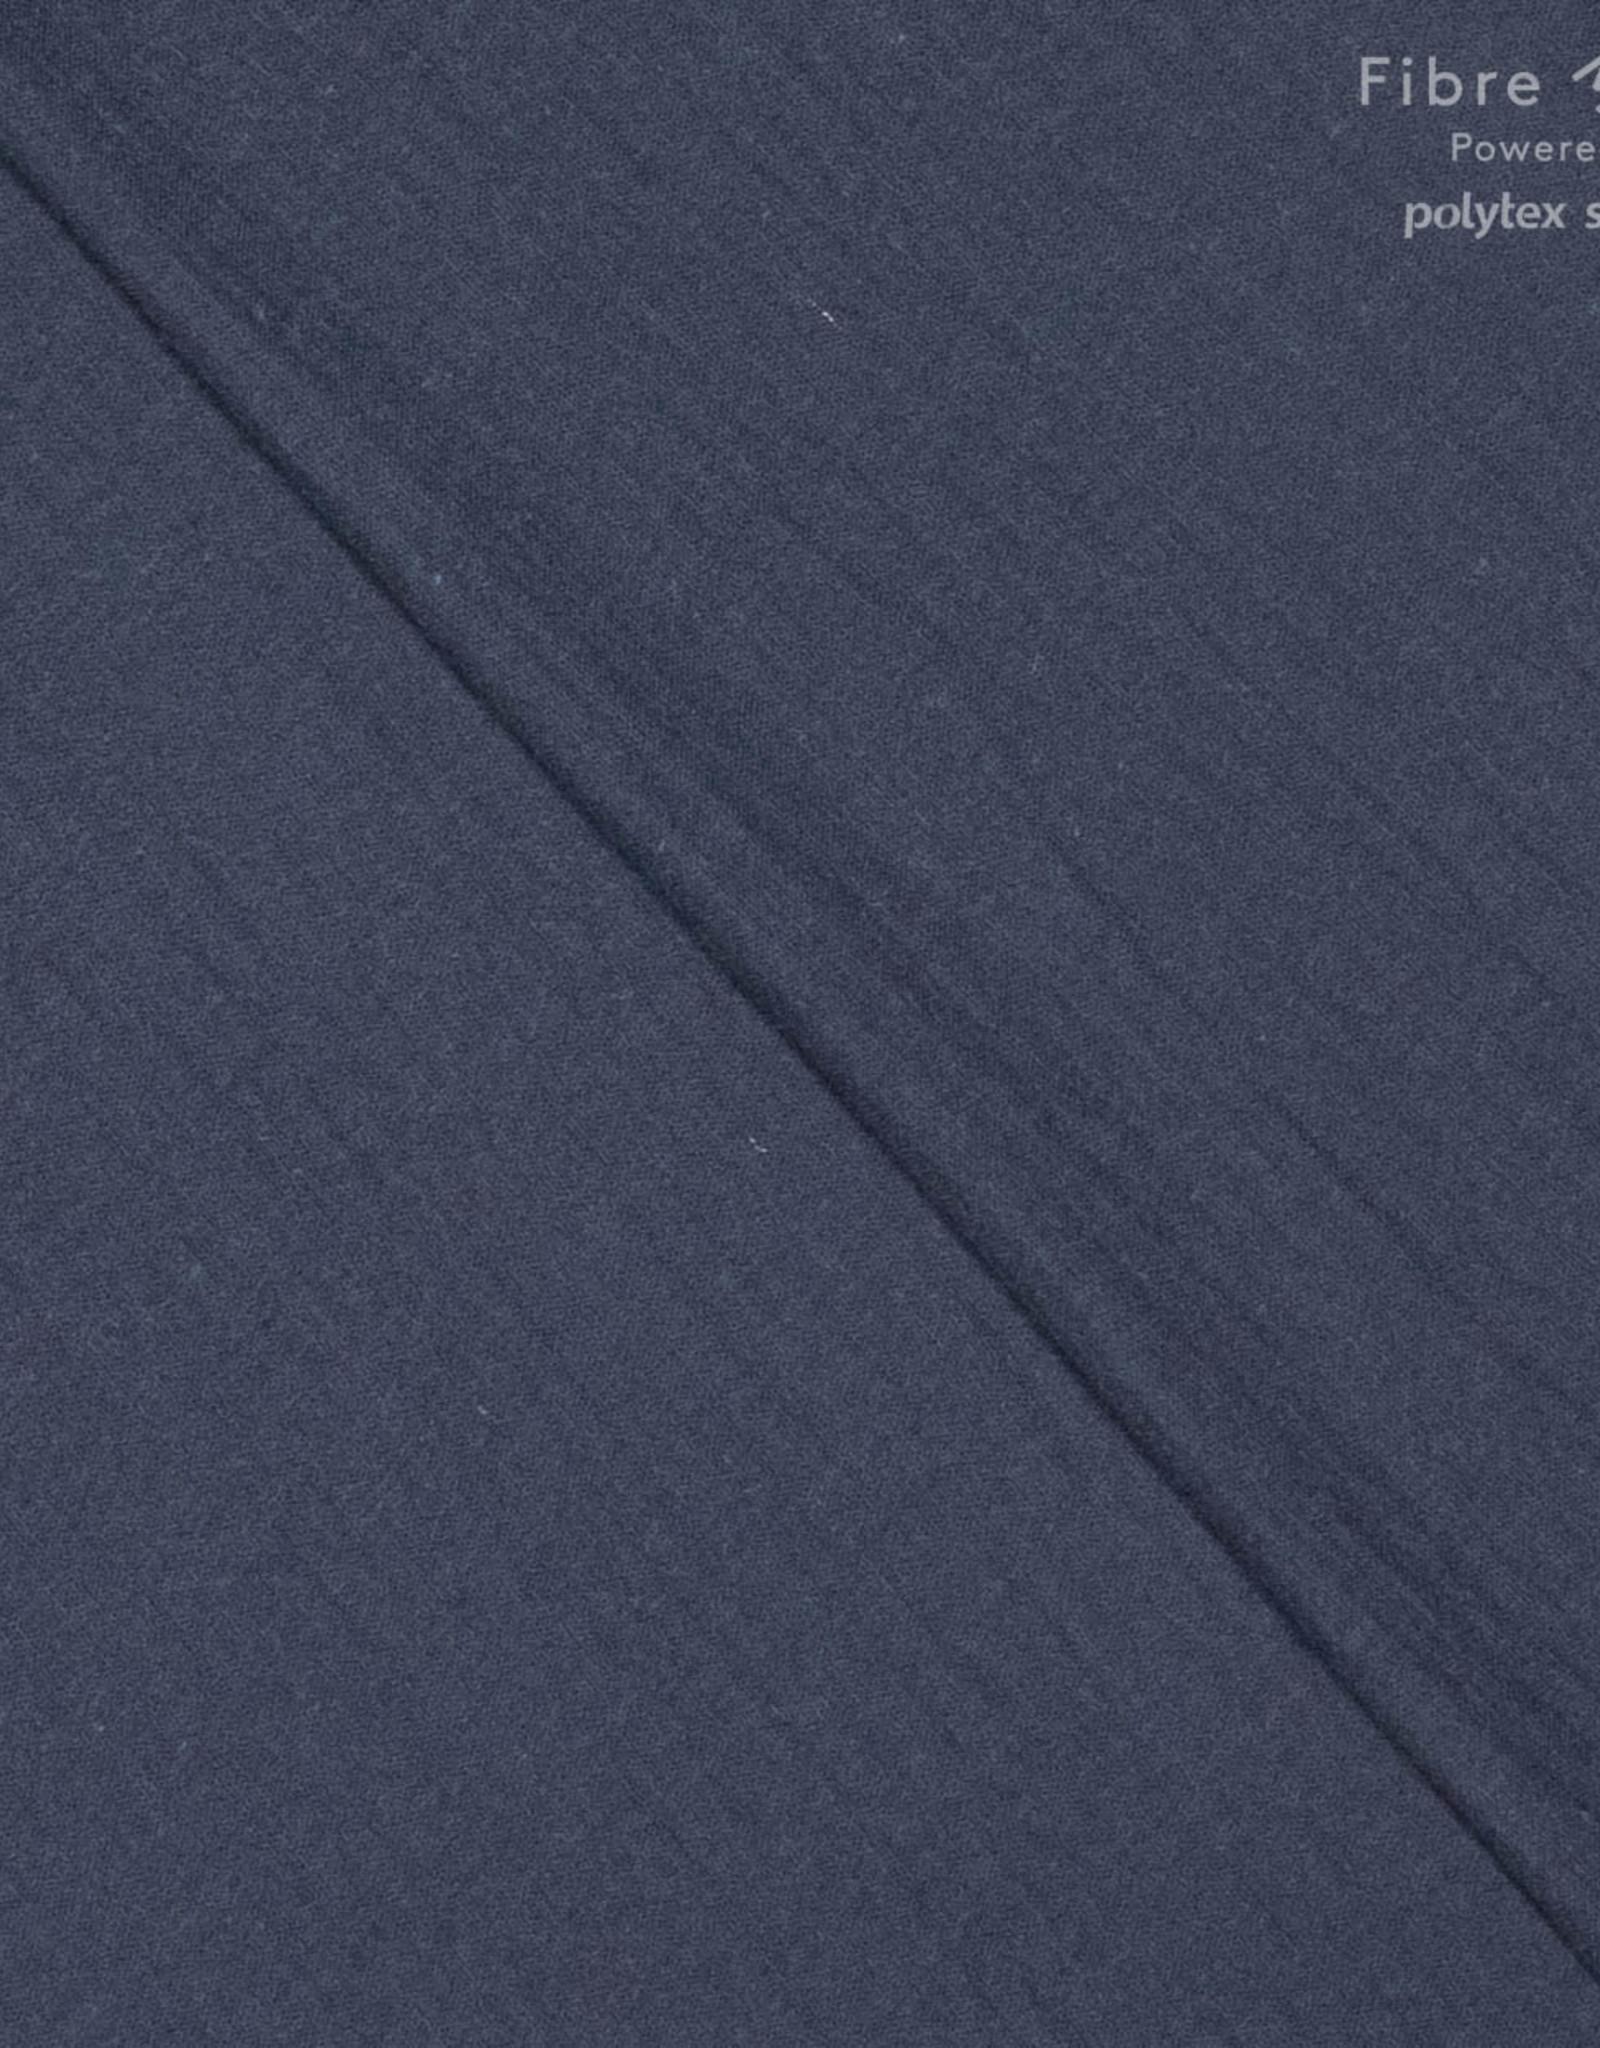 Fibre Mood Fibre Mood editie 15 hydrofiel donker sapphire blauw (Lou)